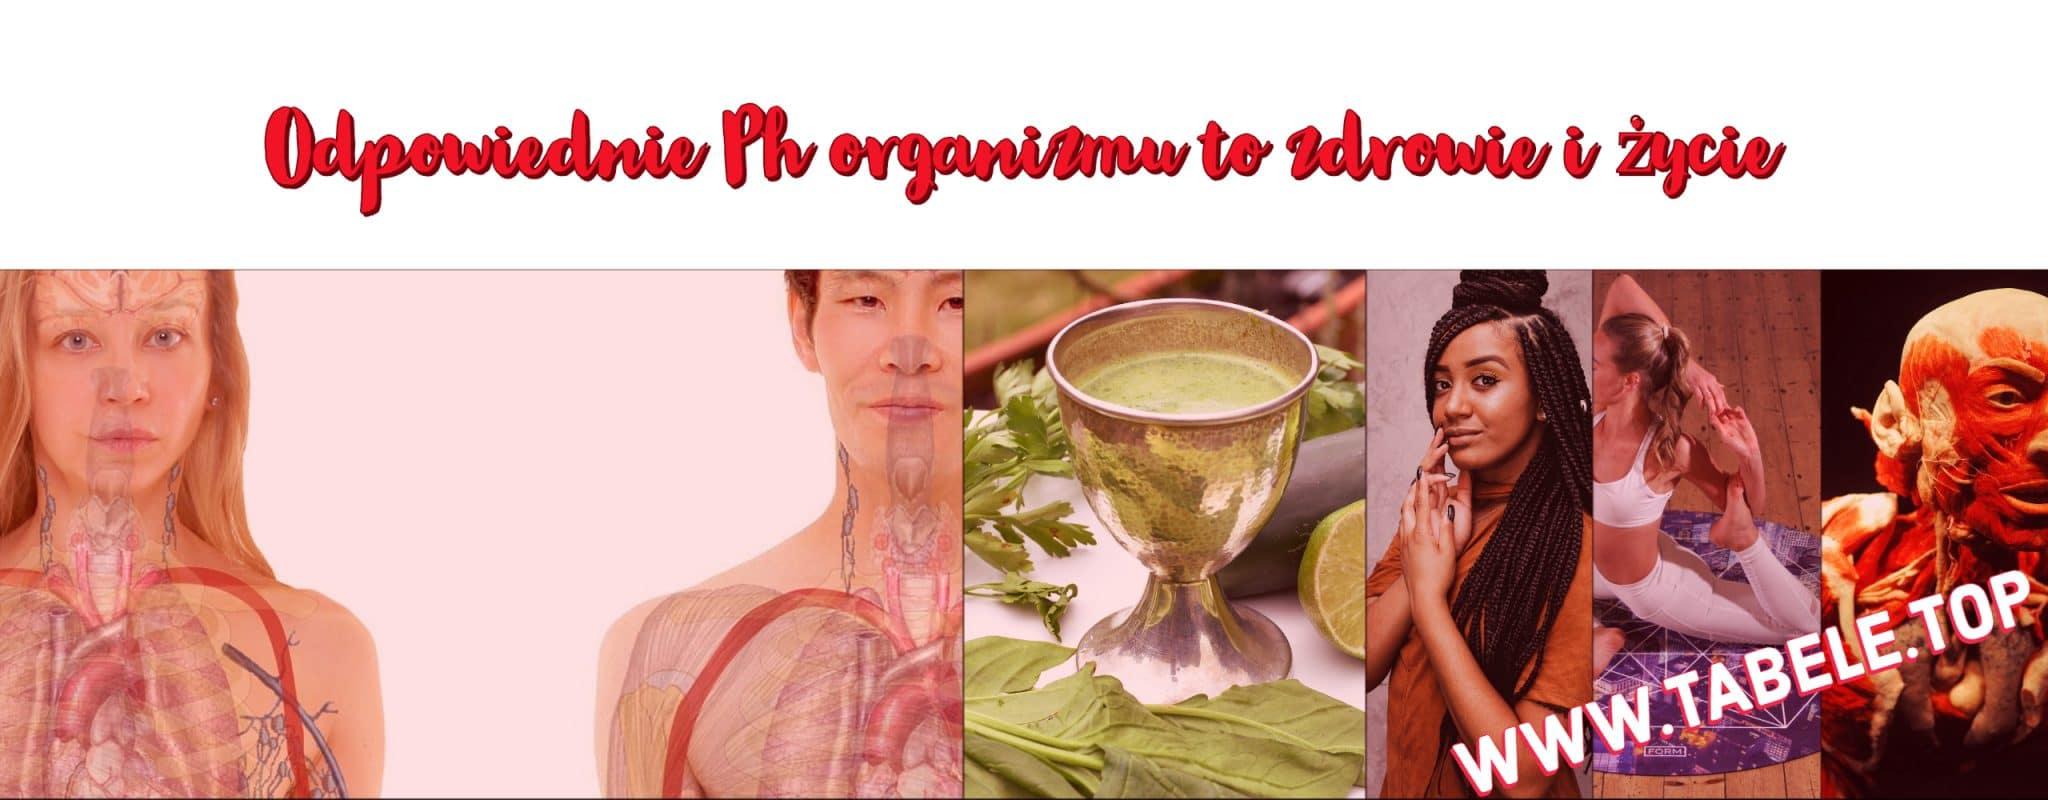 ph organizmu